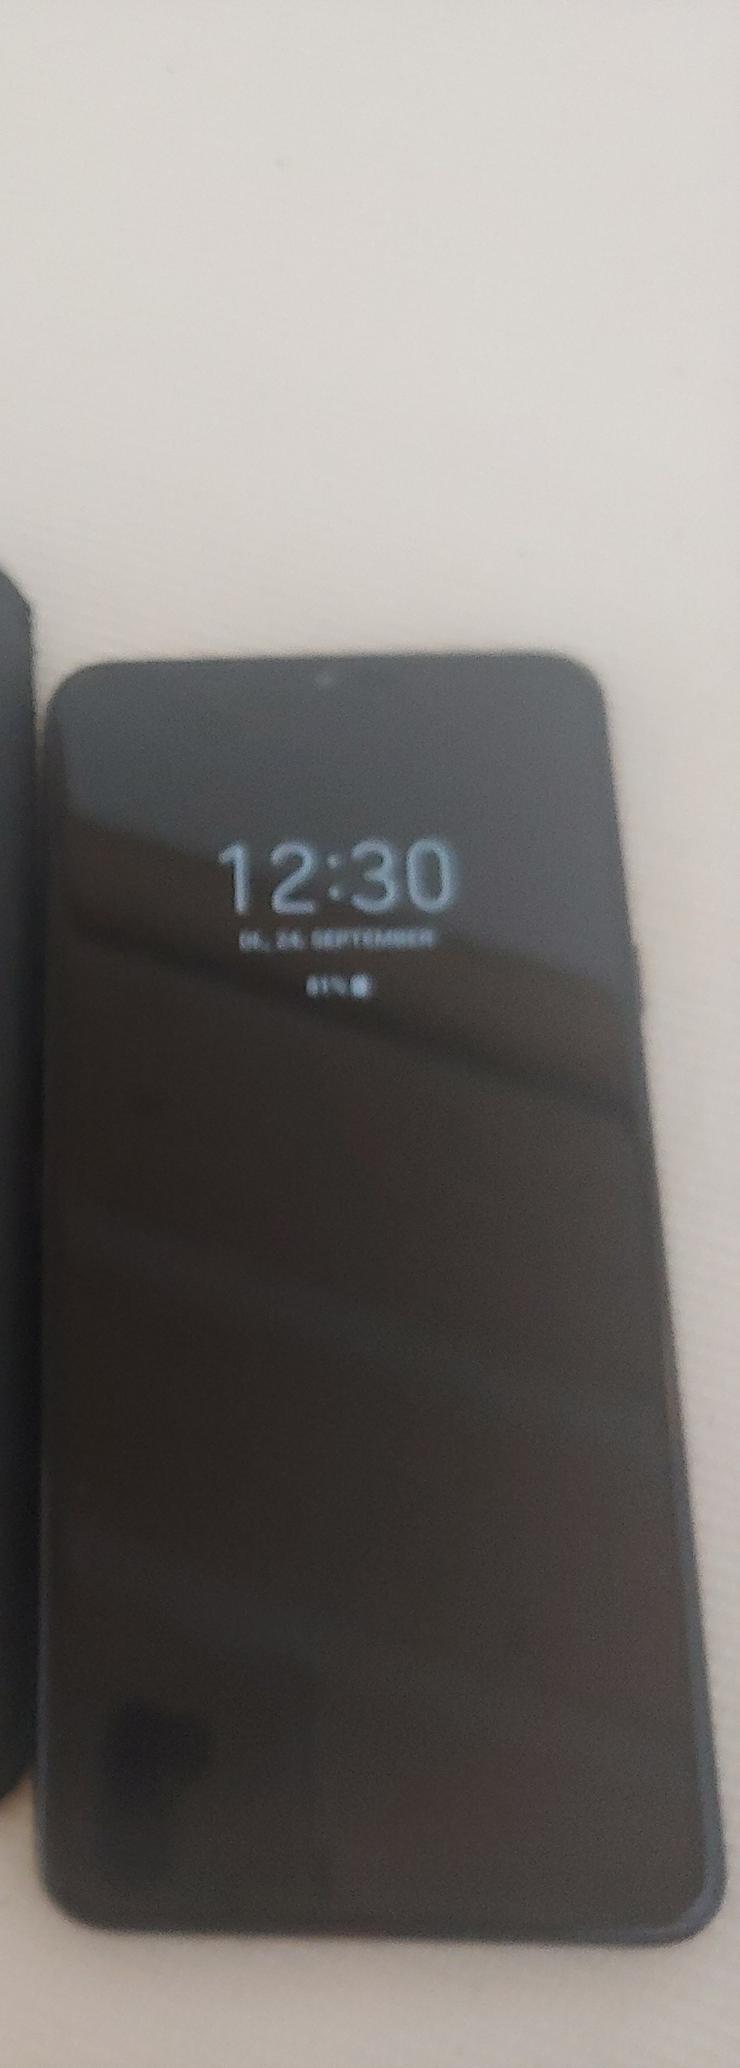 lg g7 thinq q - Handys & Smartphones - Bild 1